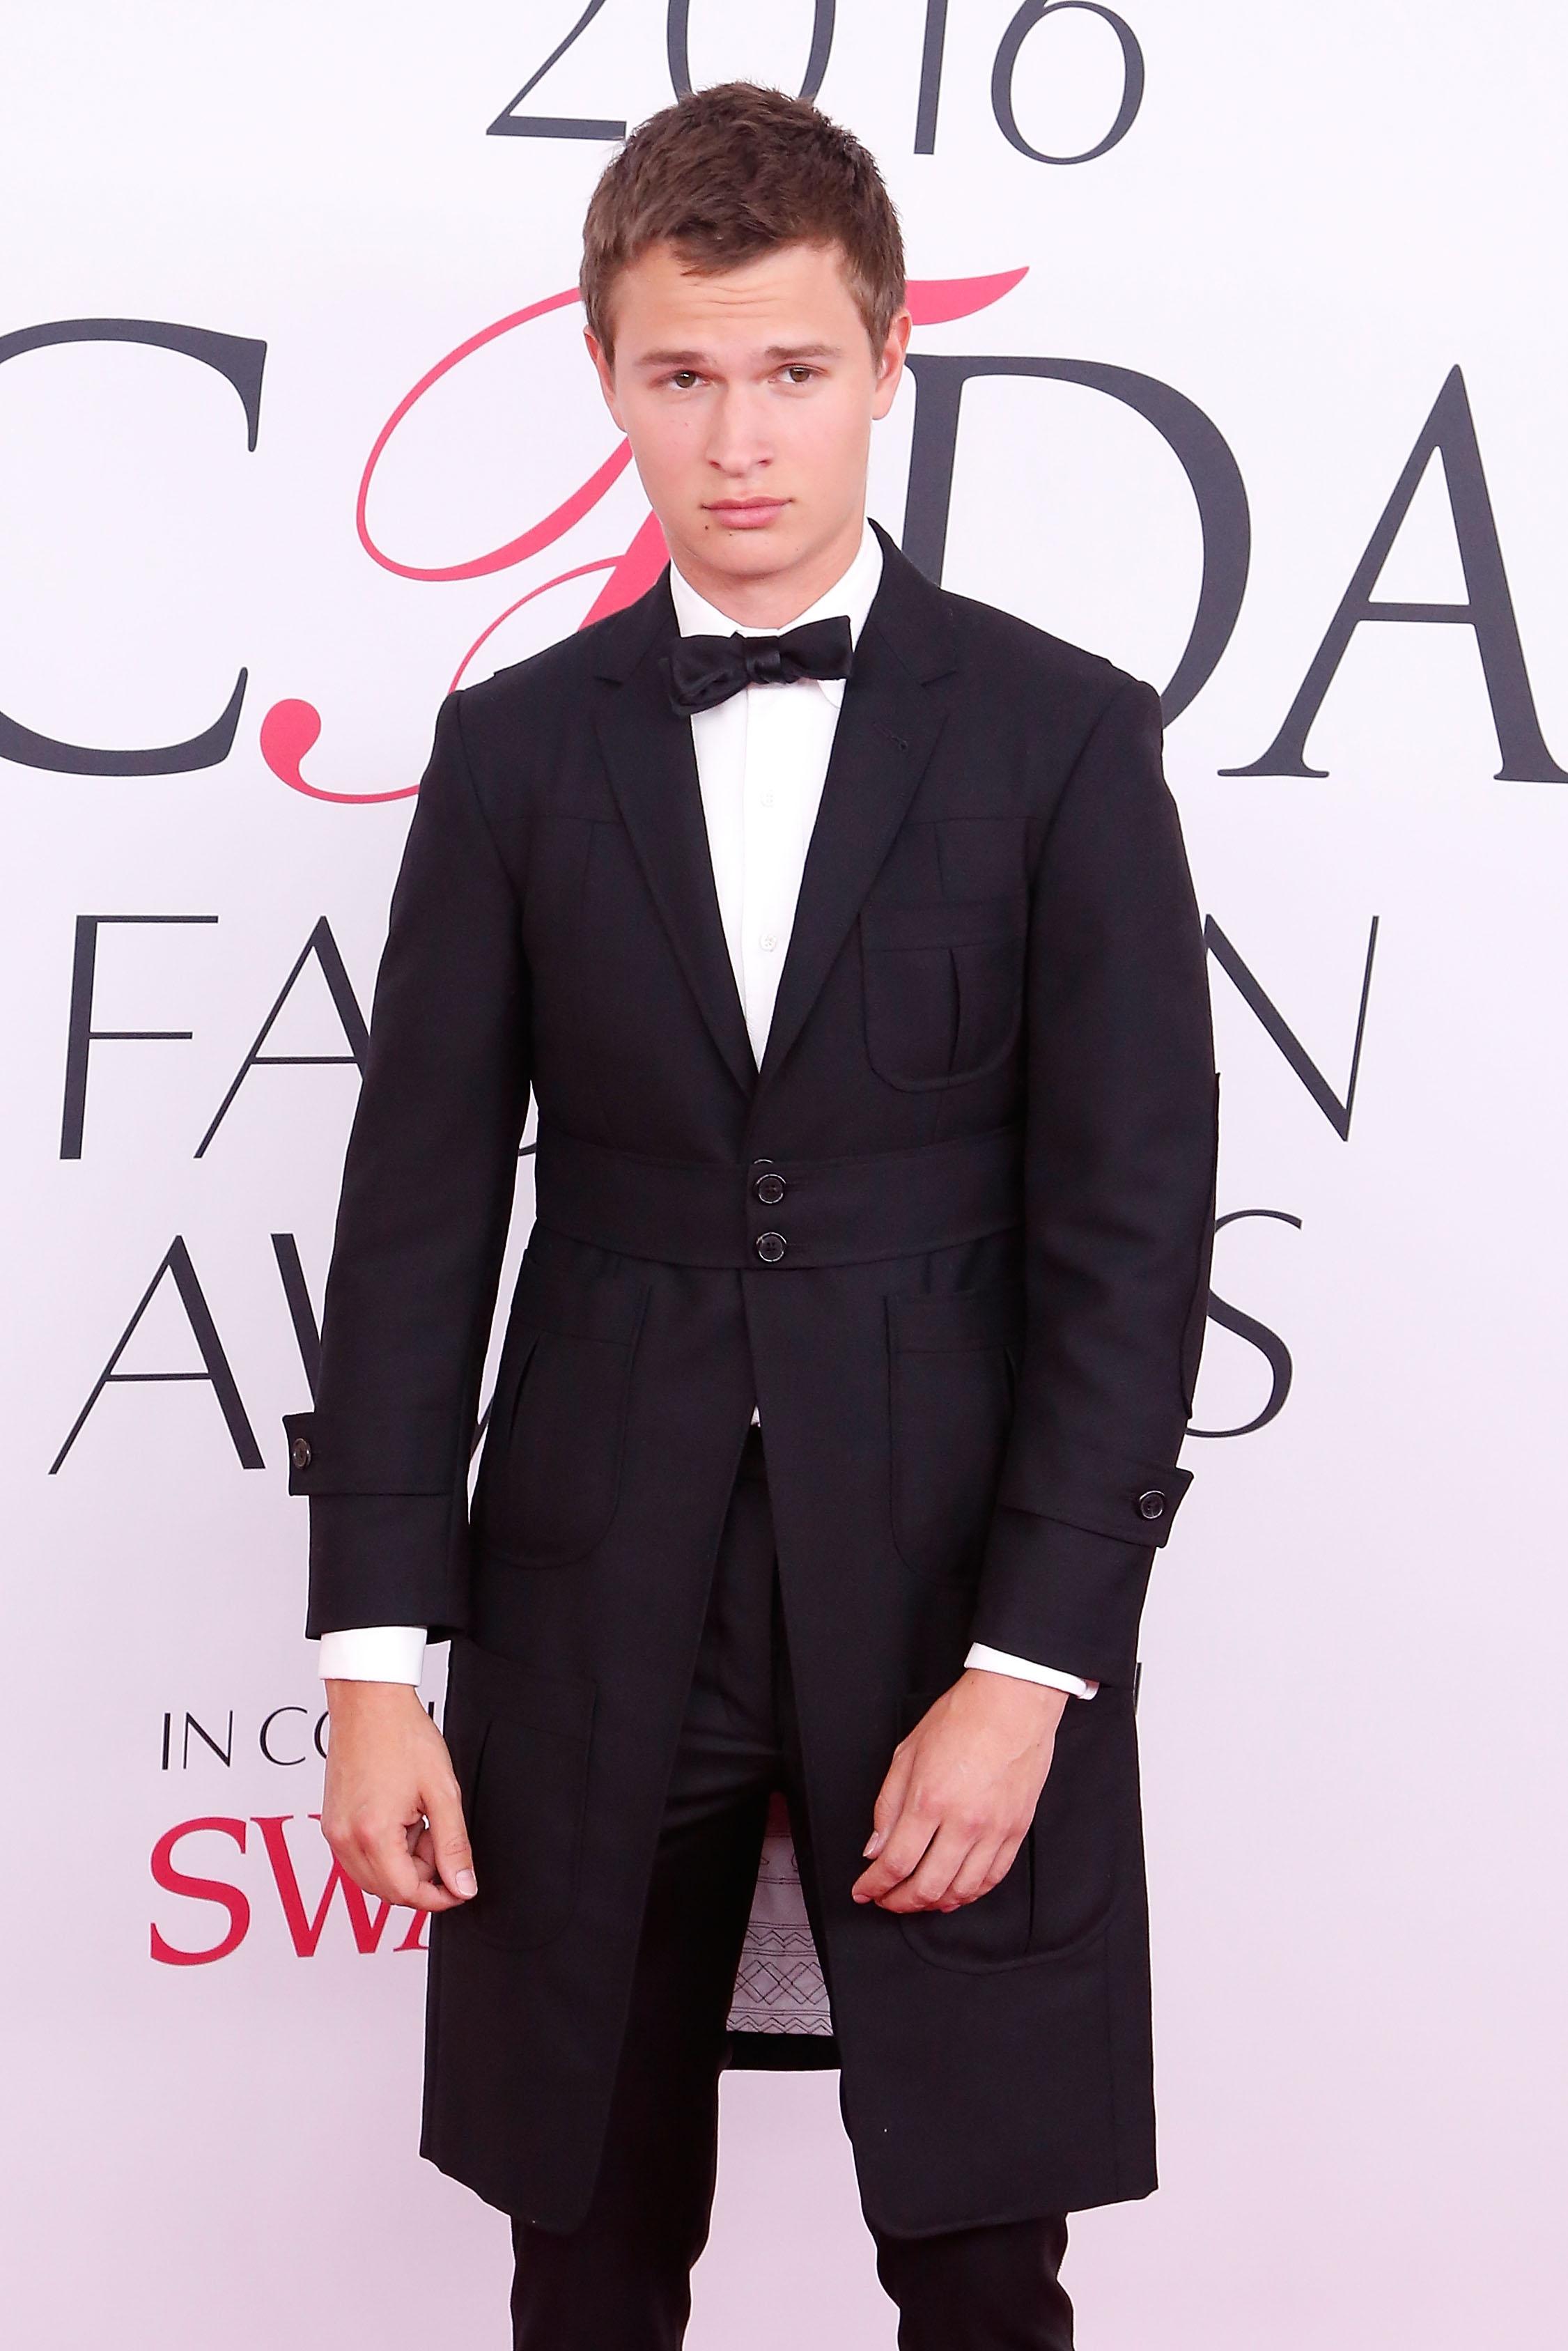 2016 CFDA Fashion Awards - Arrivals